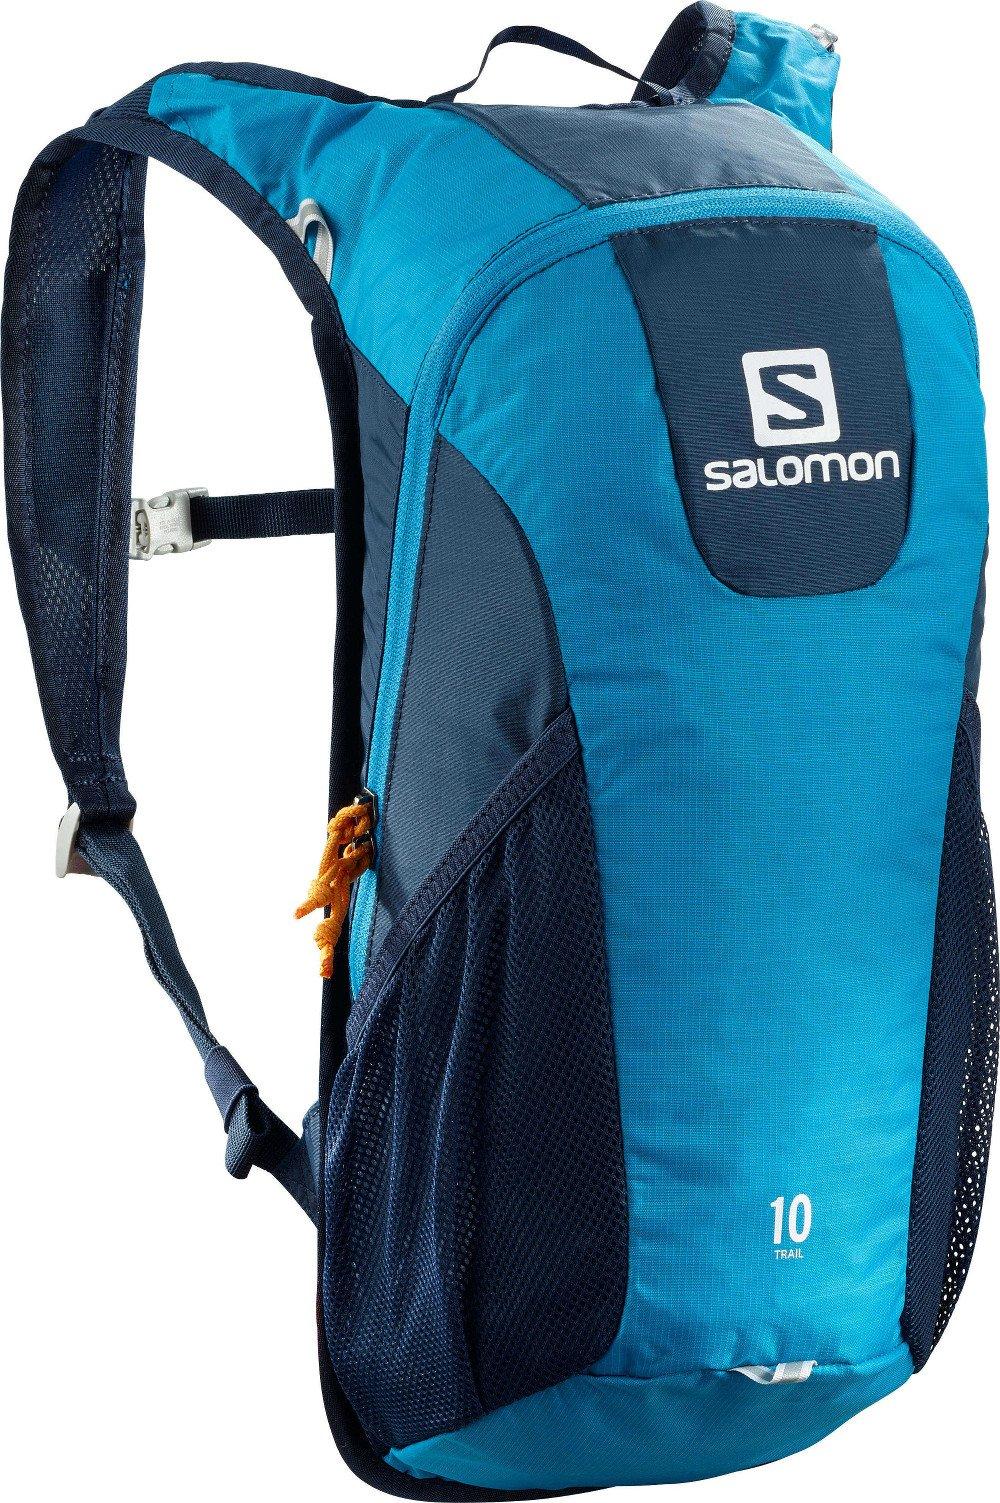 Backpack Salomon BAG TRAIL 10